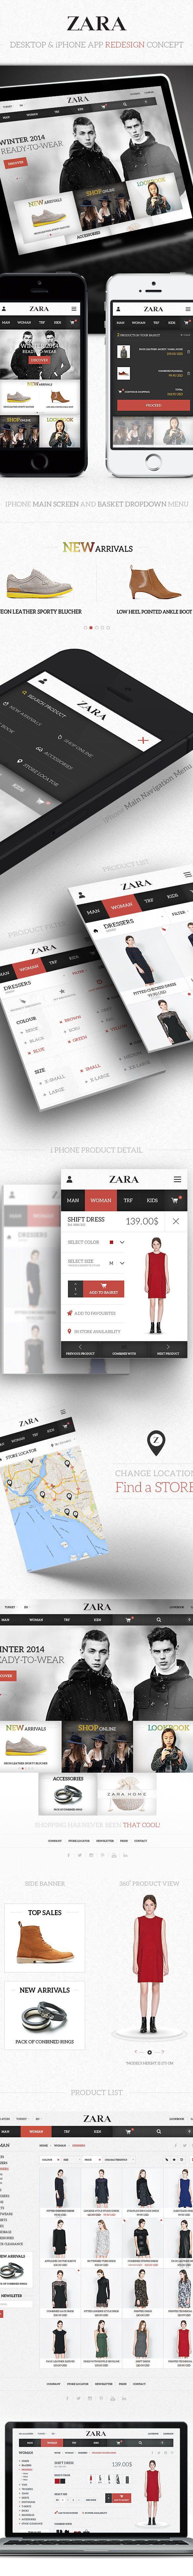 Zara / Desktop & iPhone App Redesign on Behance